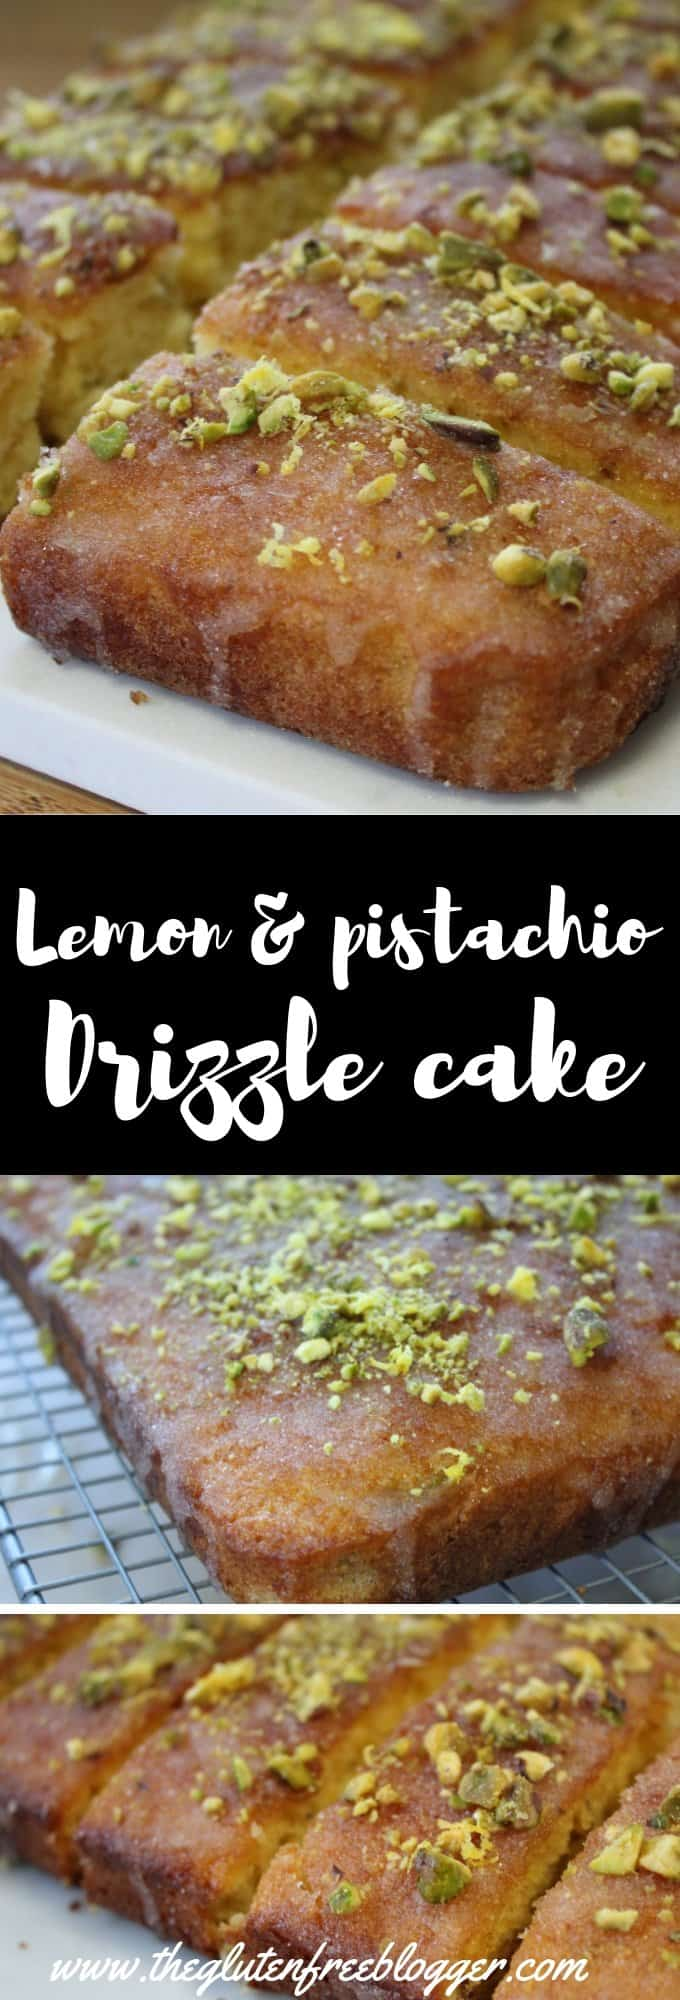 gluten free cake - gluten free lemon and pistachio drizzle cake - lemon drizzle cake